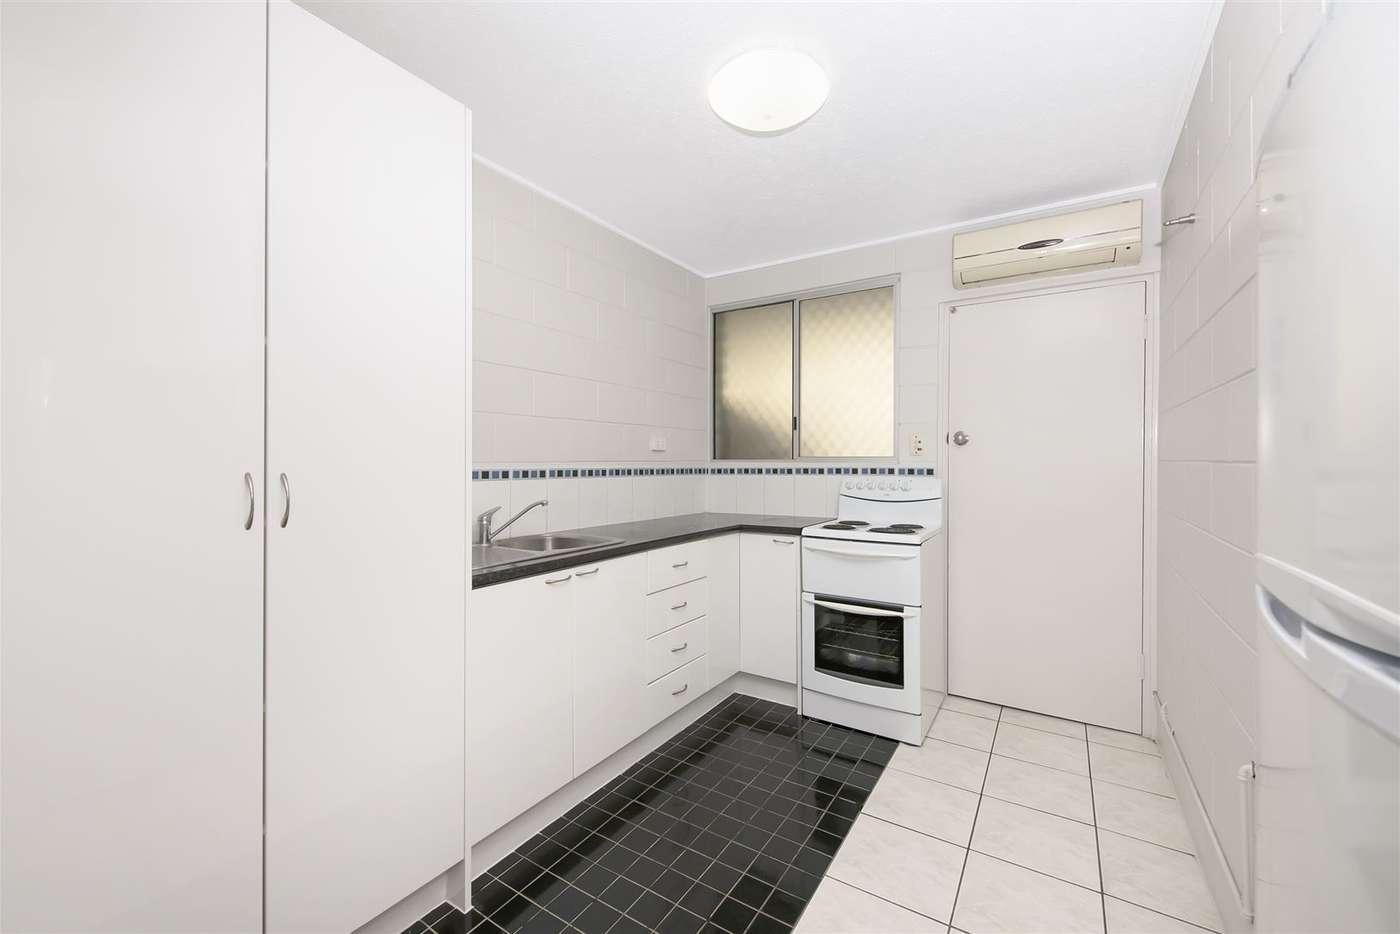 Sixth view of Homely blockOfUnits listing, 30 Rose Street, North Ward QLD 4810